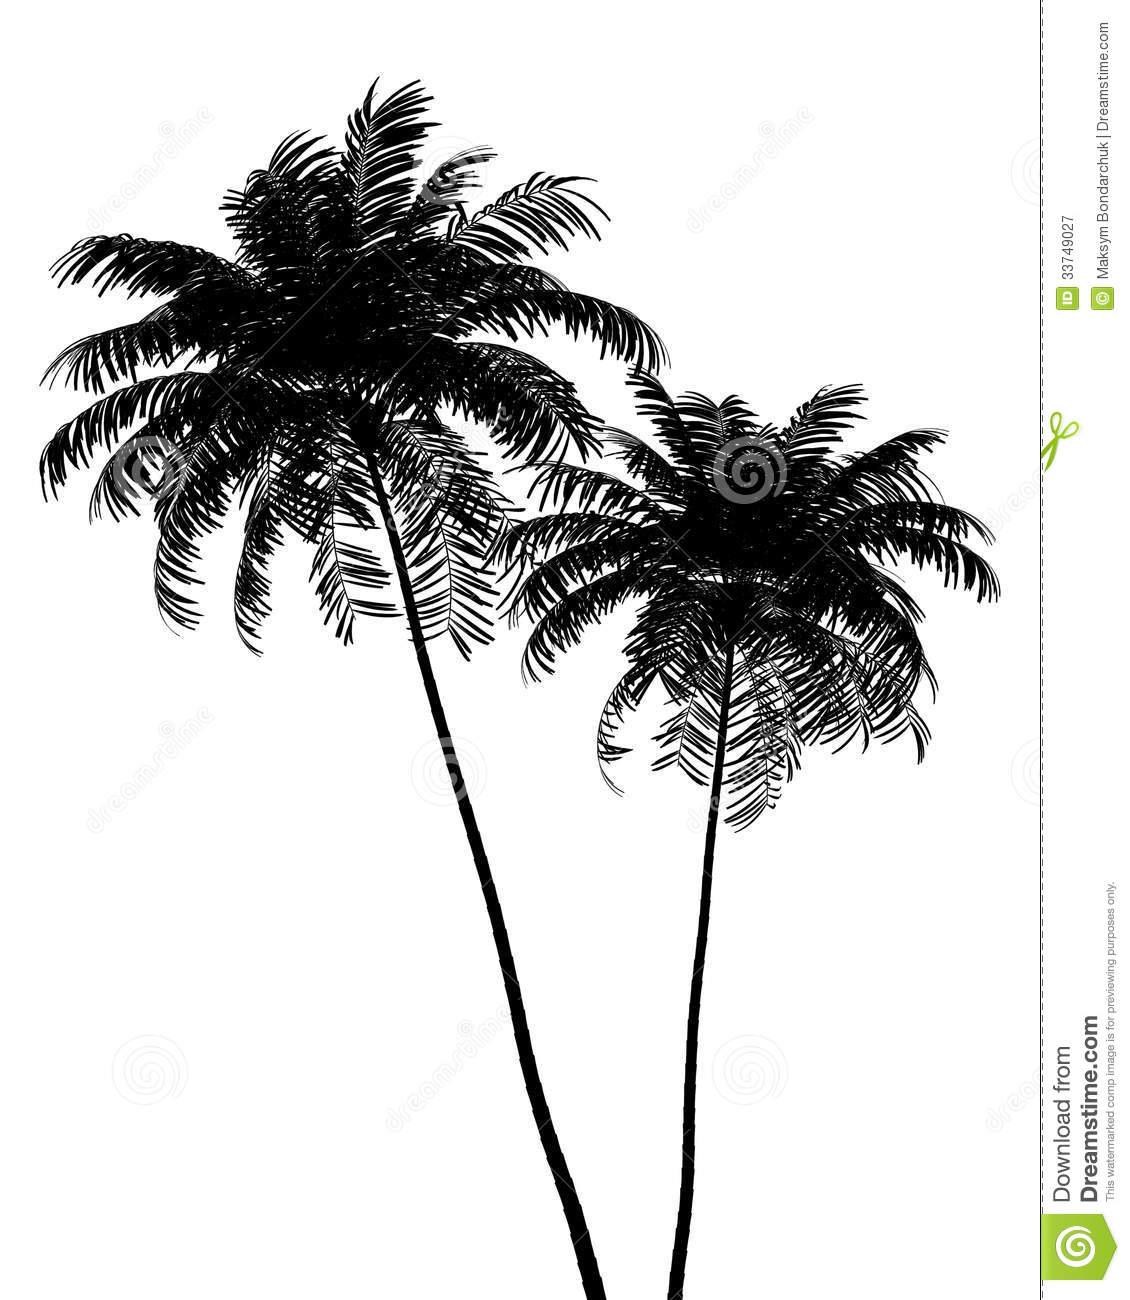 Areca palm clipart #8